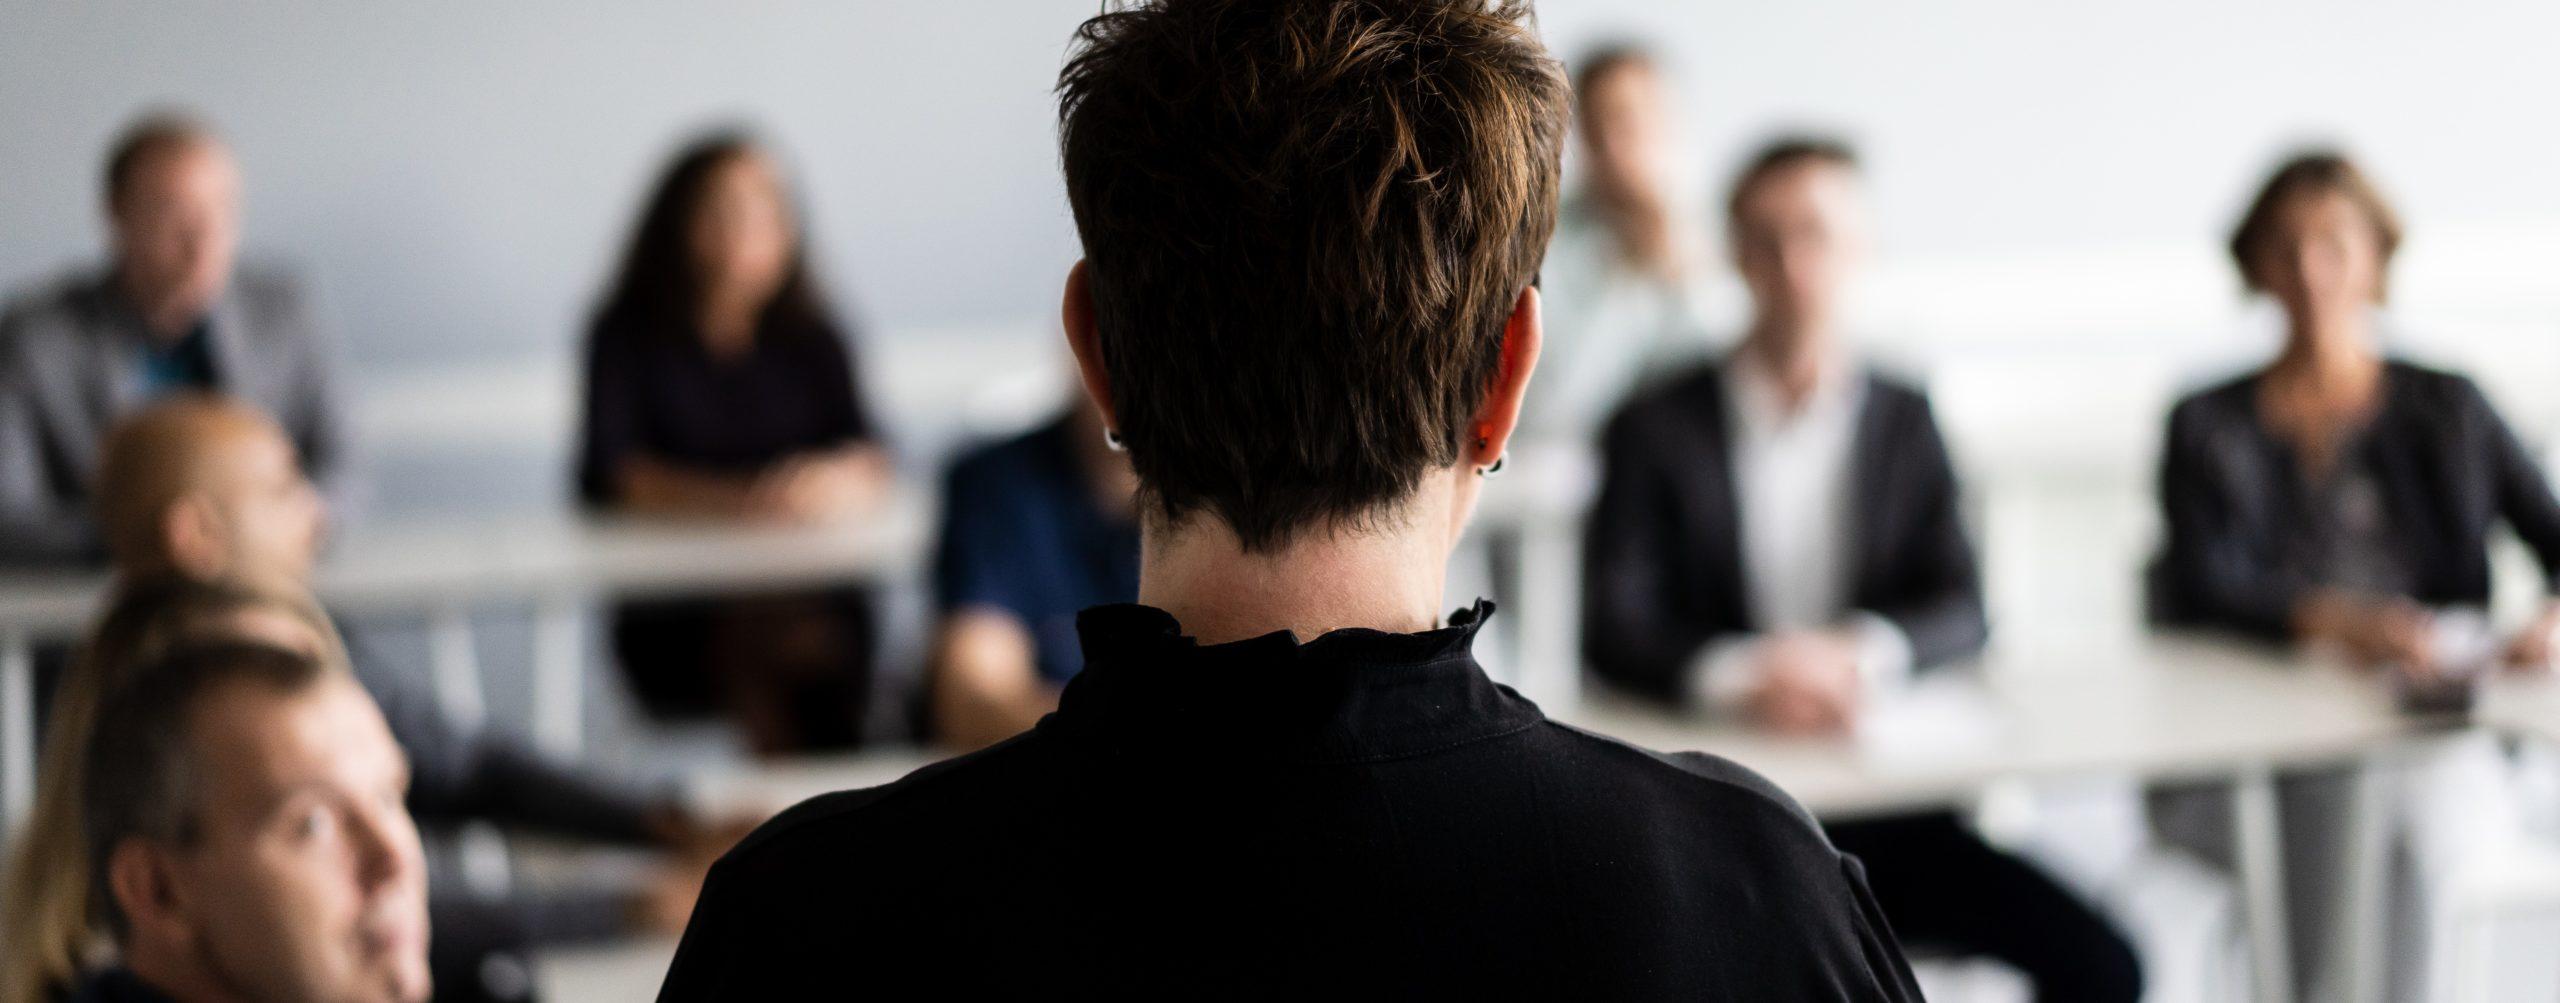 NCOD Opleidingen, opleider, publieke sector, les